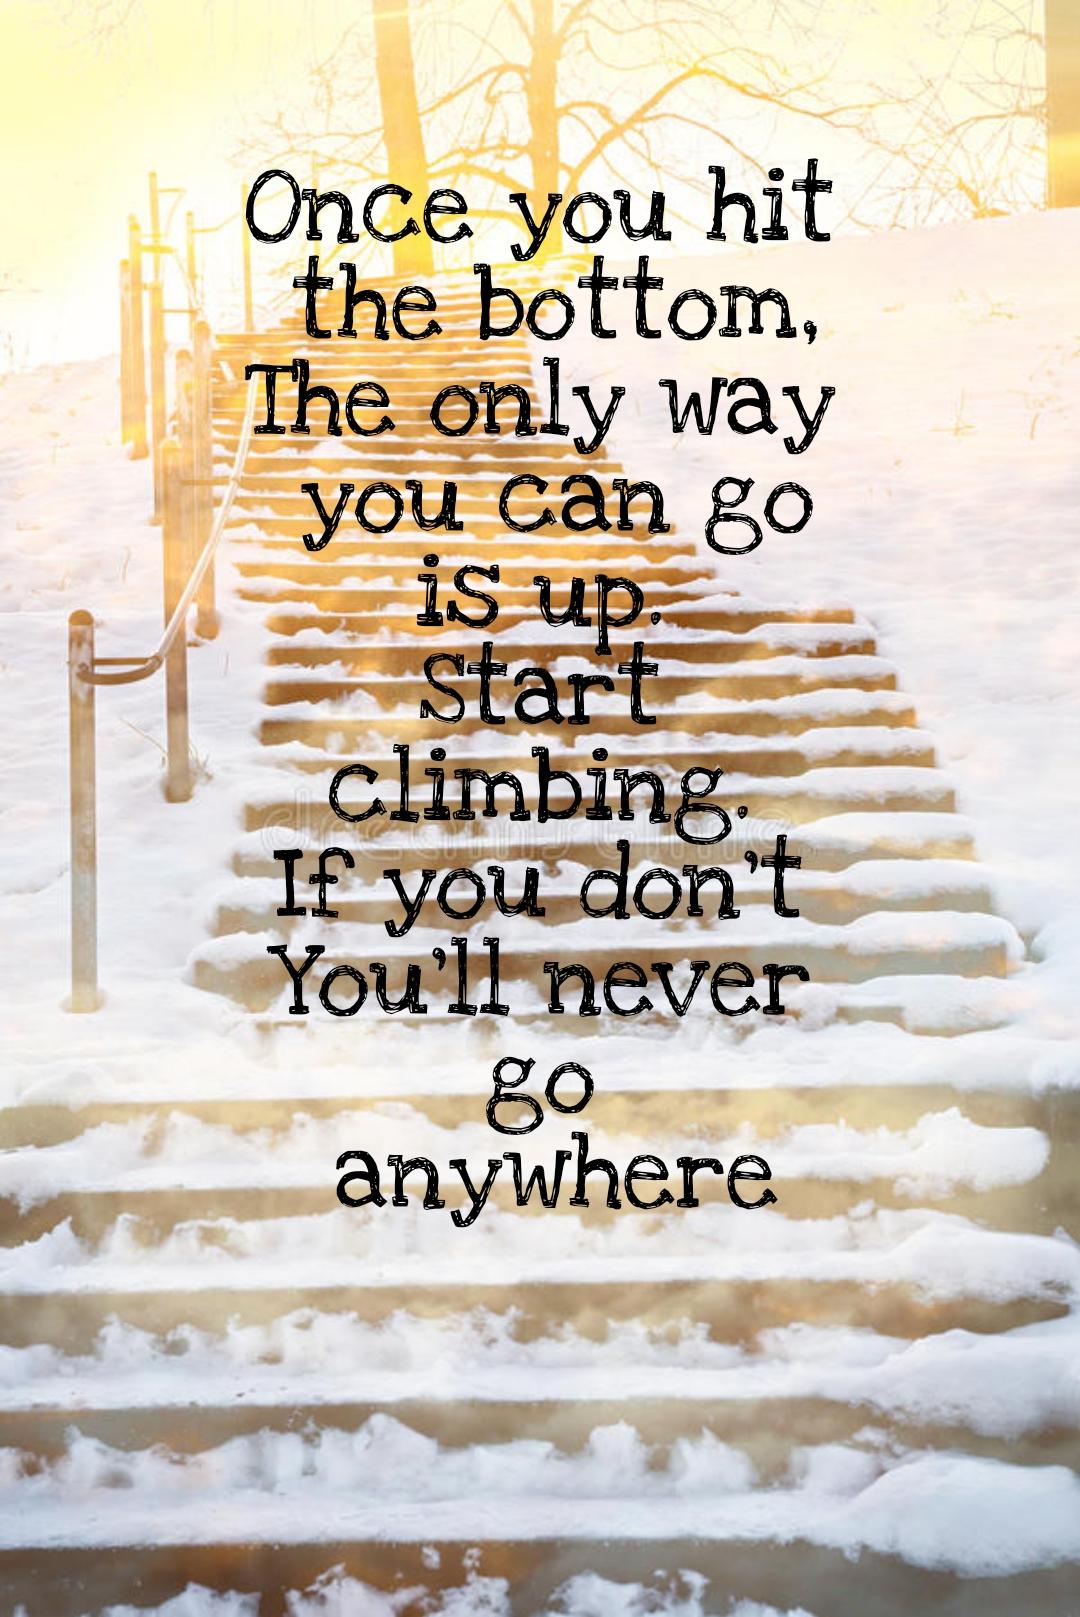 [Image] Start climbing!